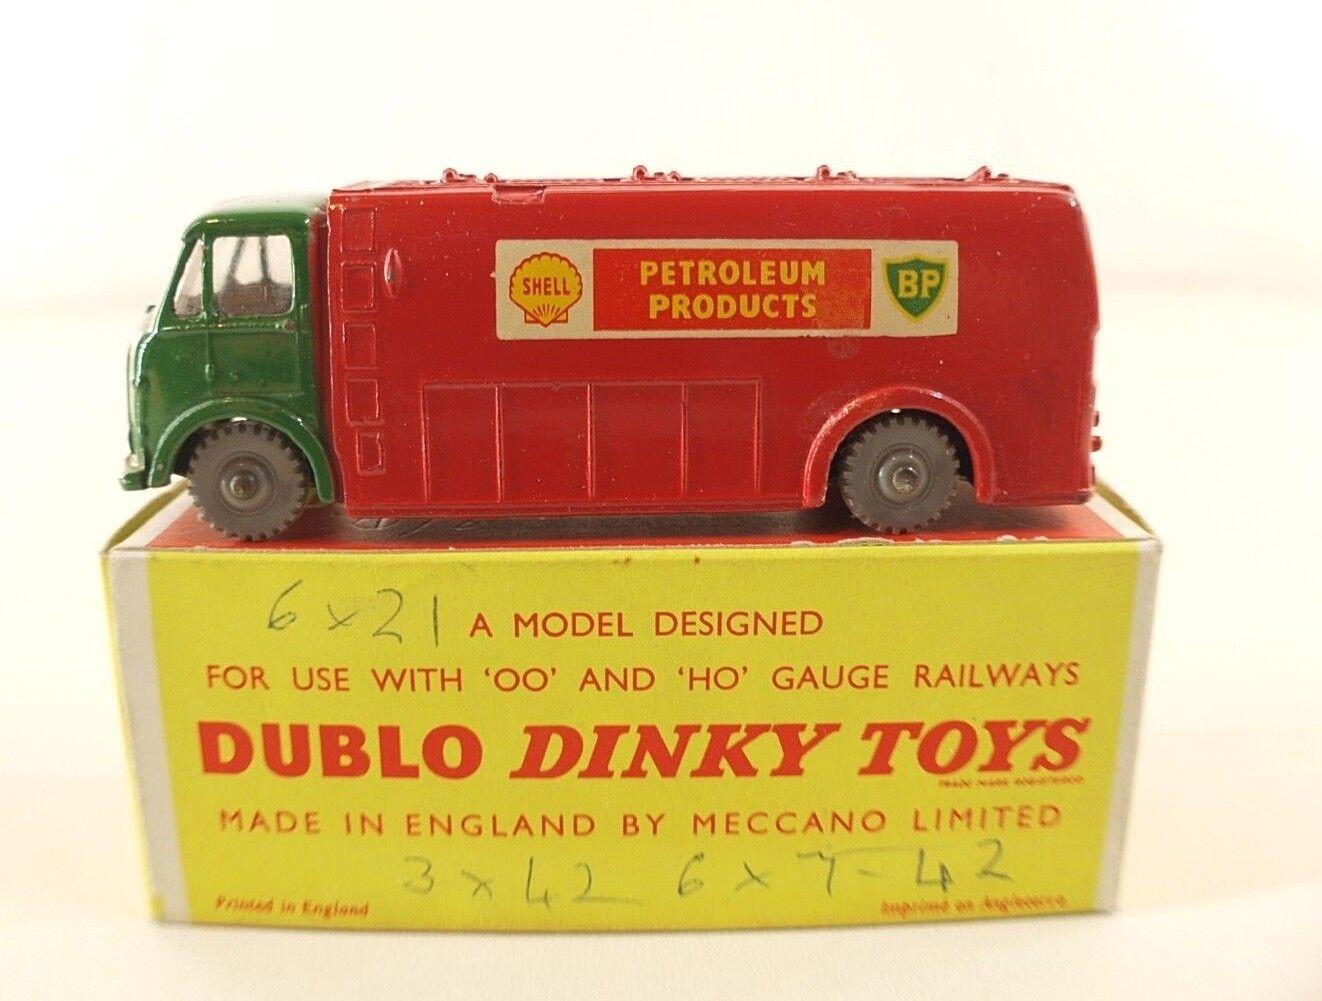 calidad fantástica Dinky Juguetes Dublo GB n° 070 070 070 camion citerne AEC Mercury SHELL BP neuf boîte MIB  genuina alta calidad